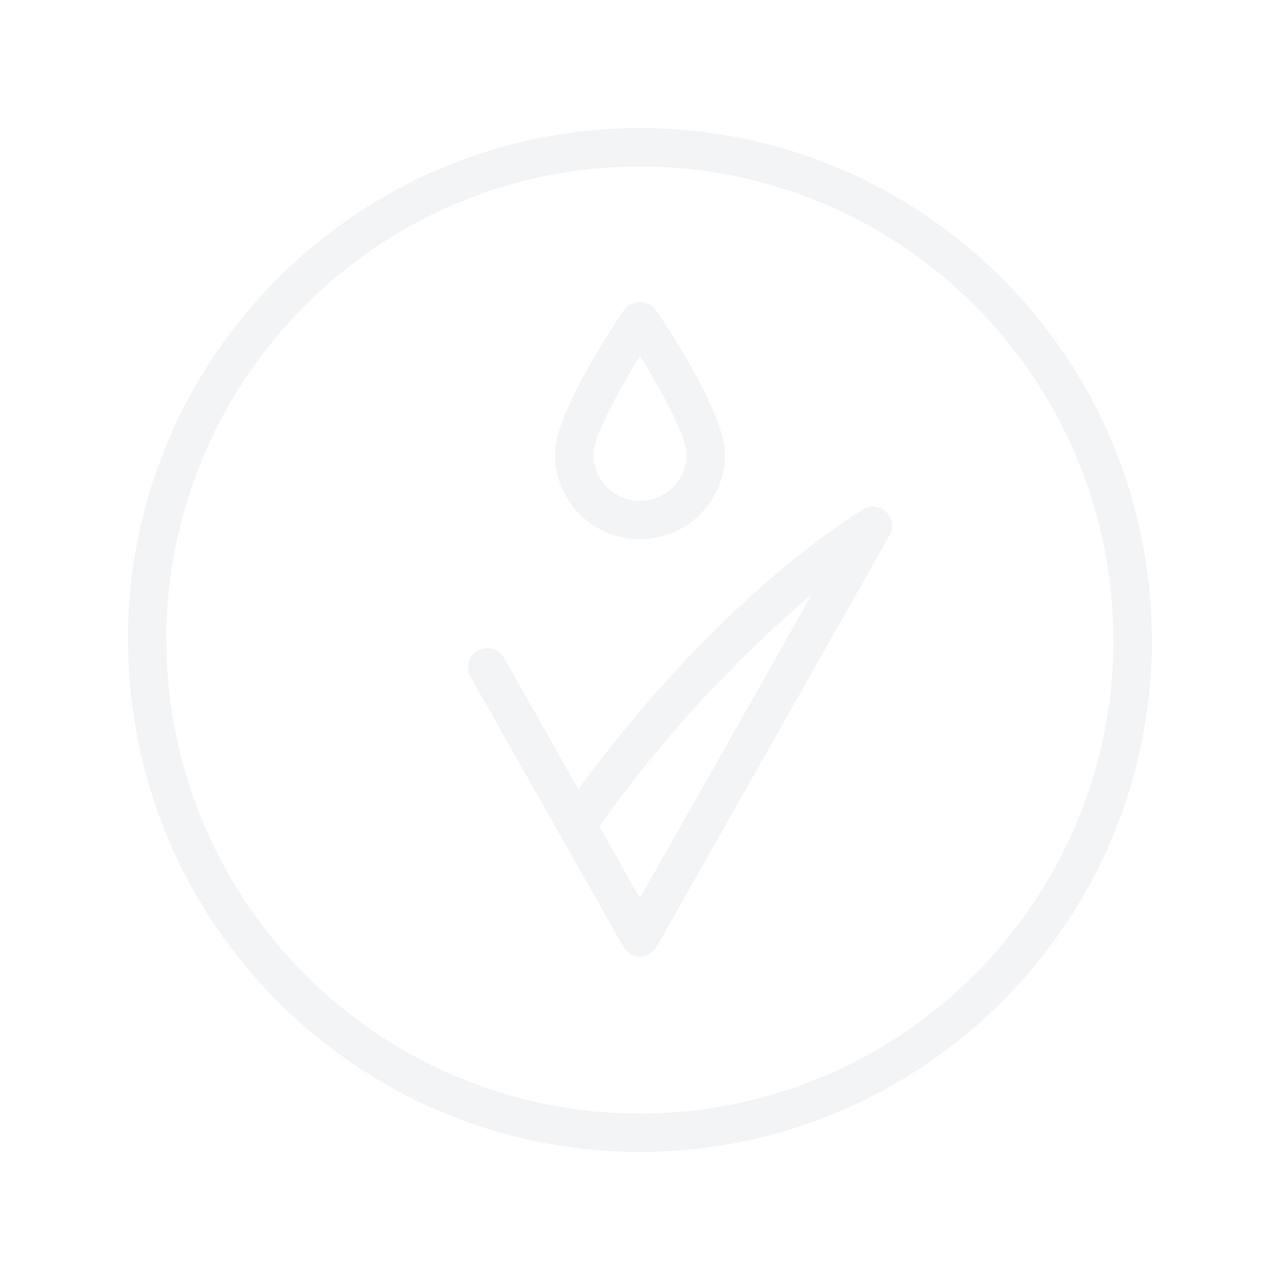 BIOTHERM Aquasource Cream (Normal/Combination Skin) 50ml